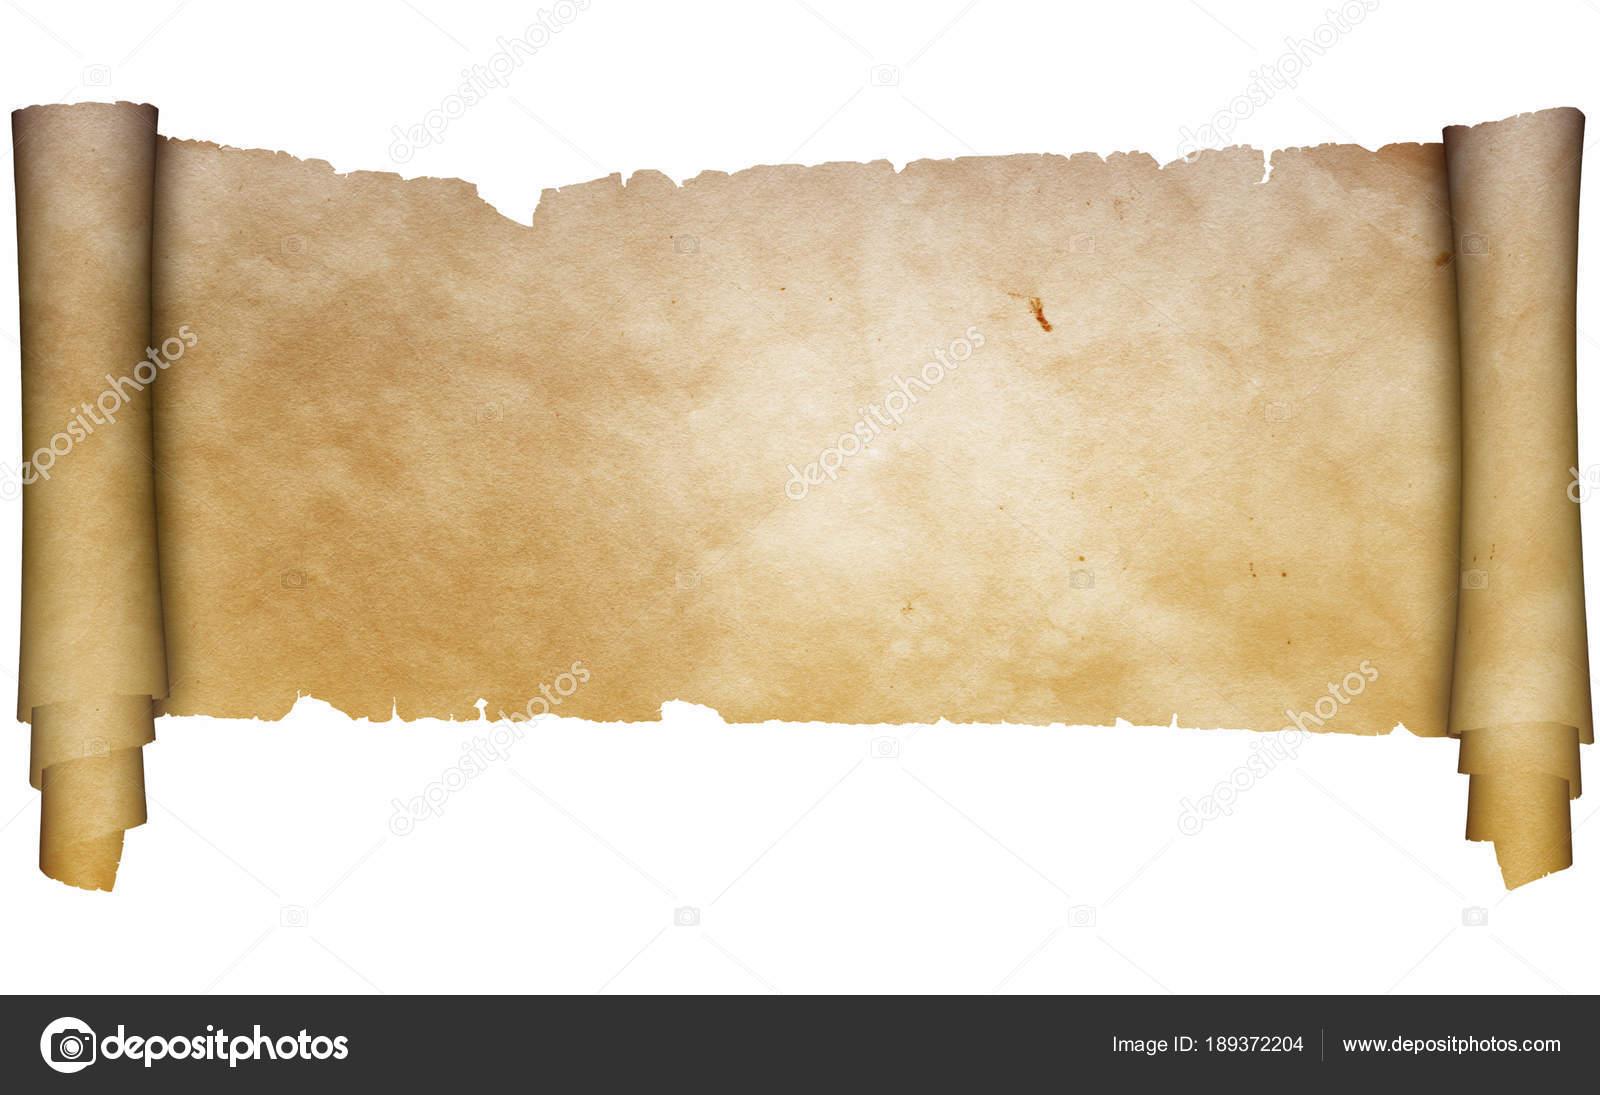 antique parchment scroll on white background stock photo ke77kz